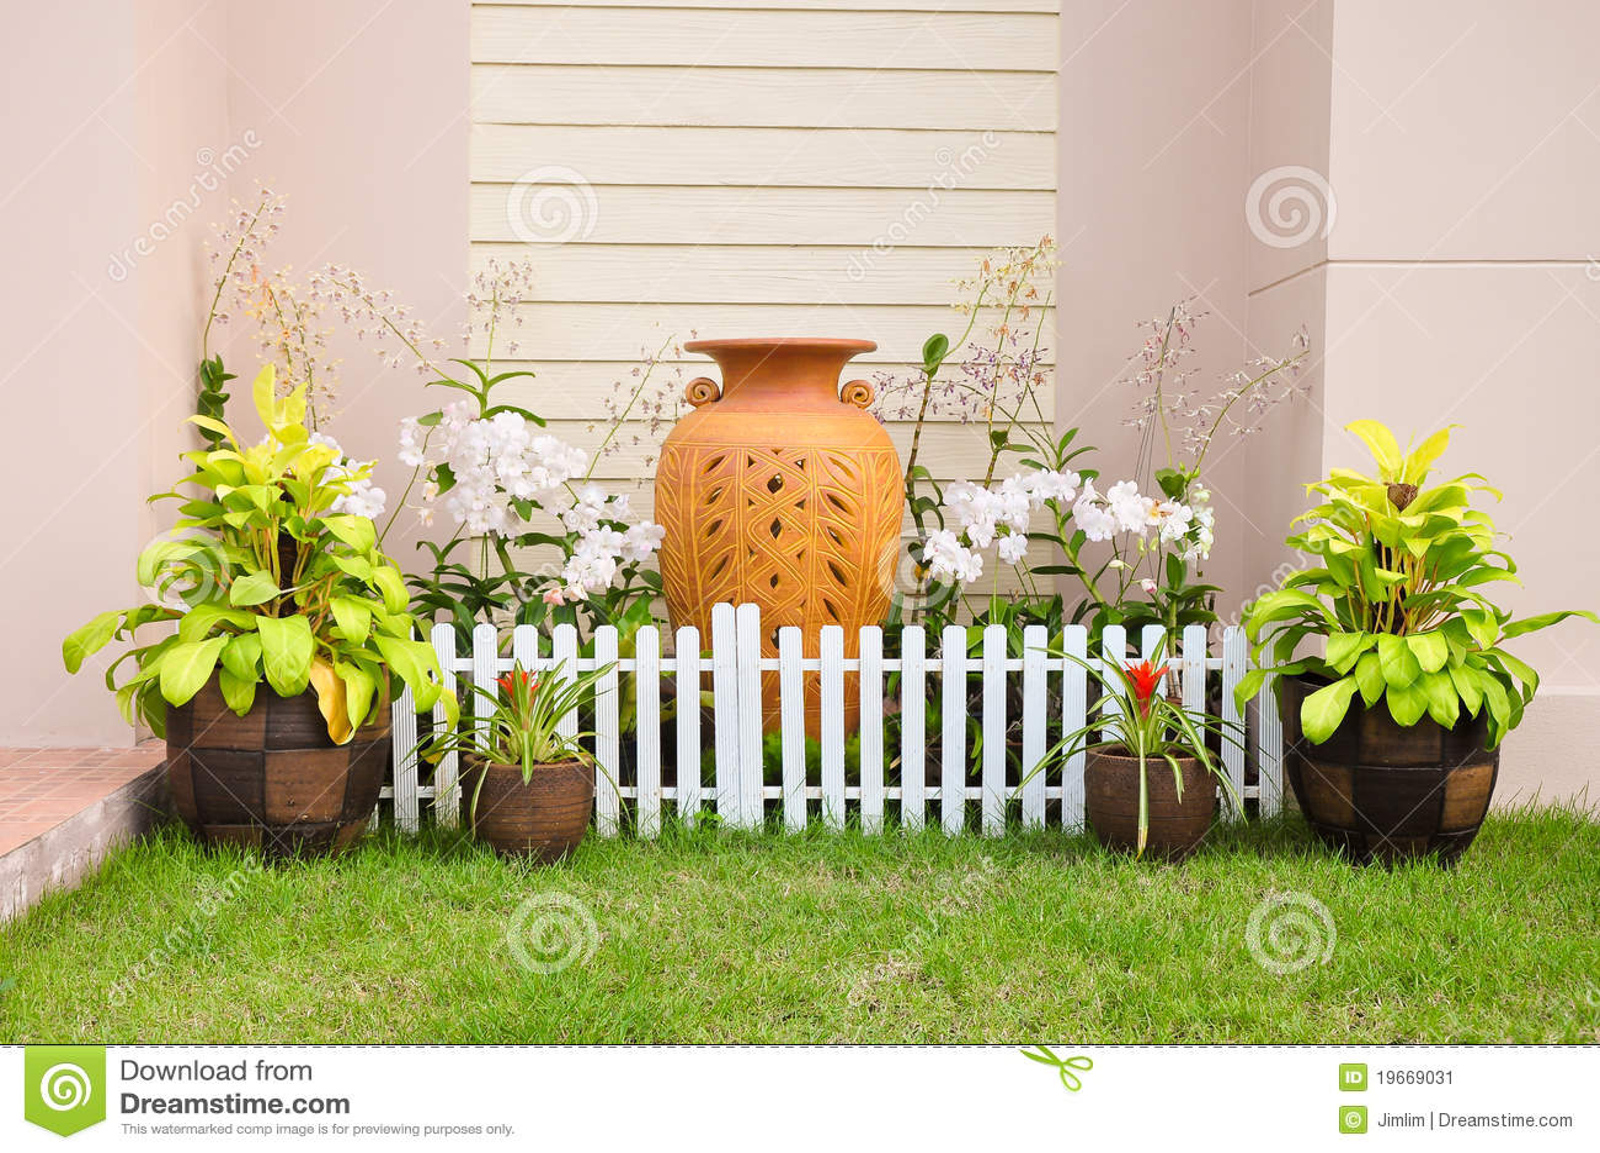 Fronti re de s curit de petite maison petit jardin image for Petite maison de jardin